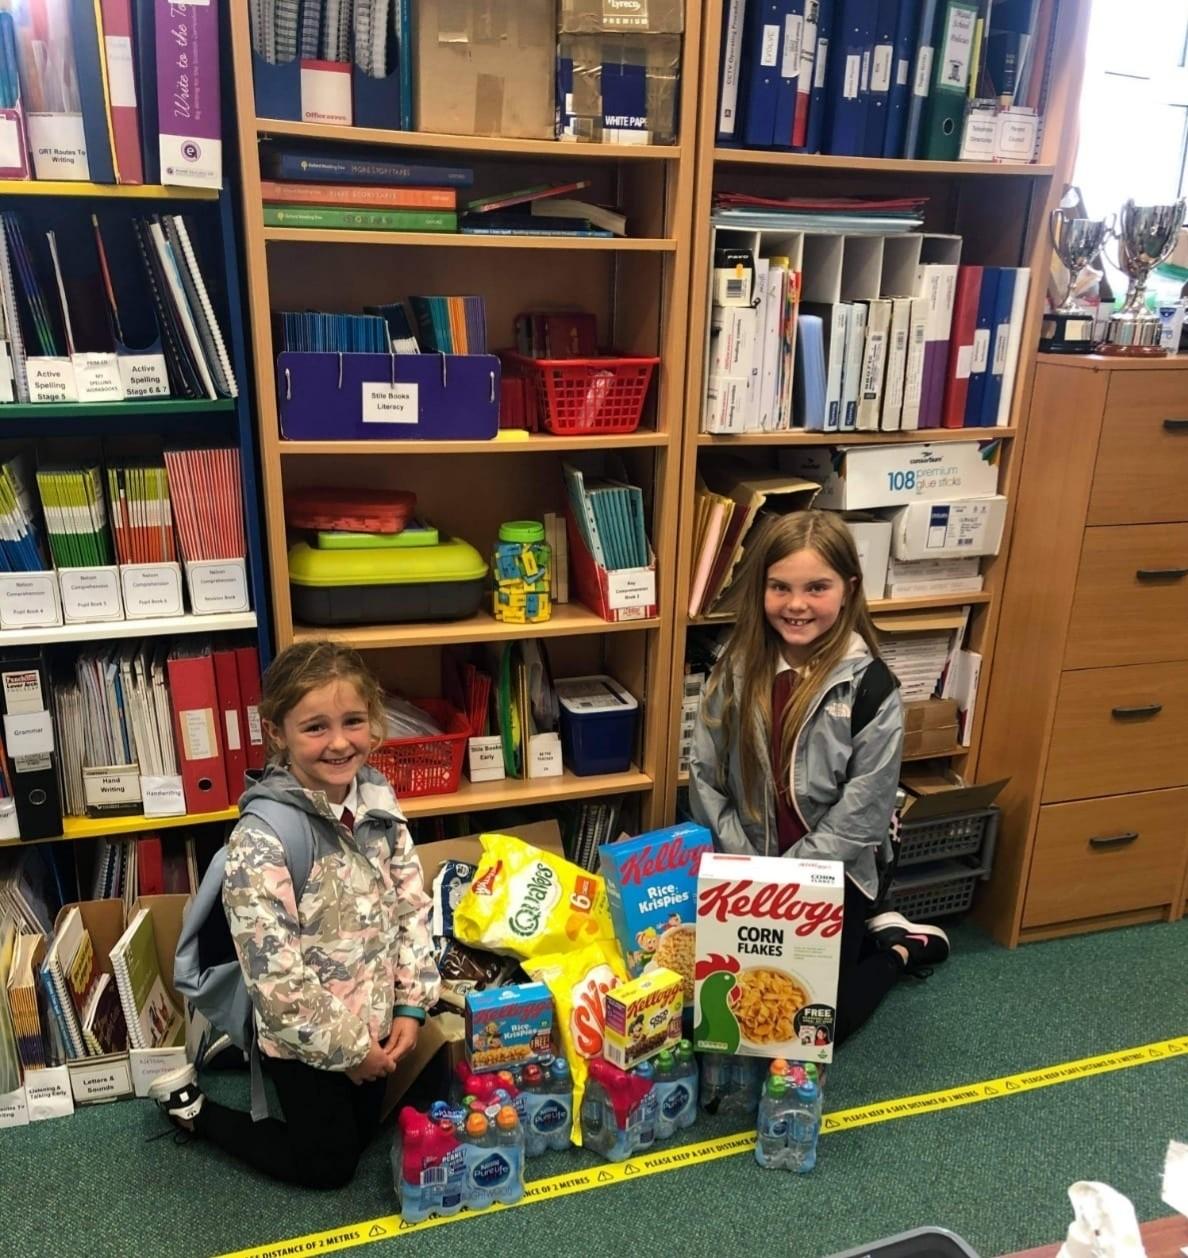 Donations to local school | Asda Peterhead